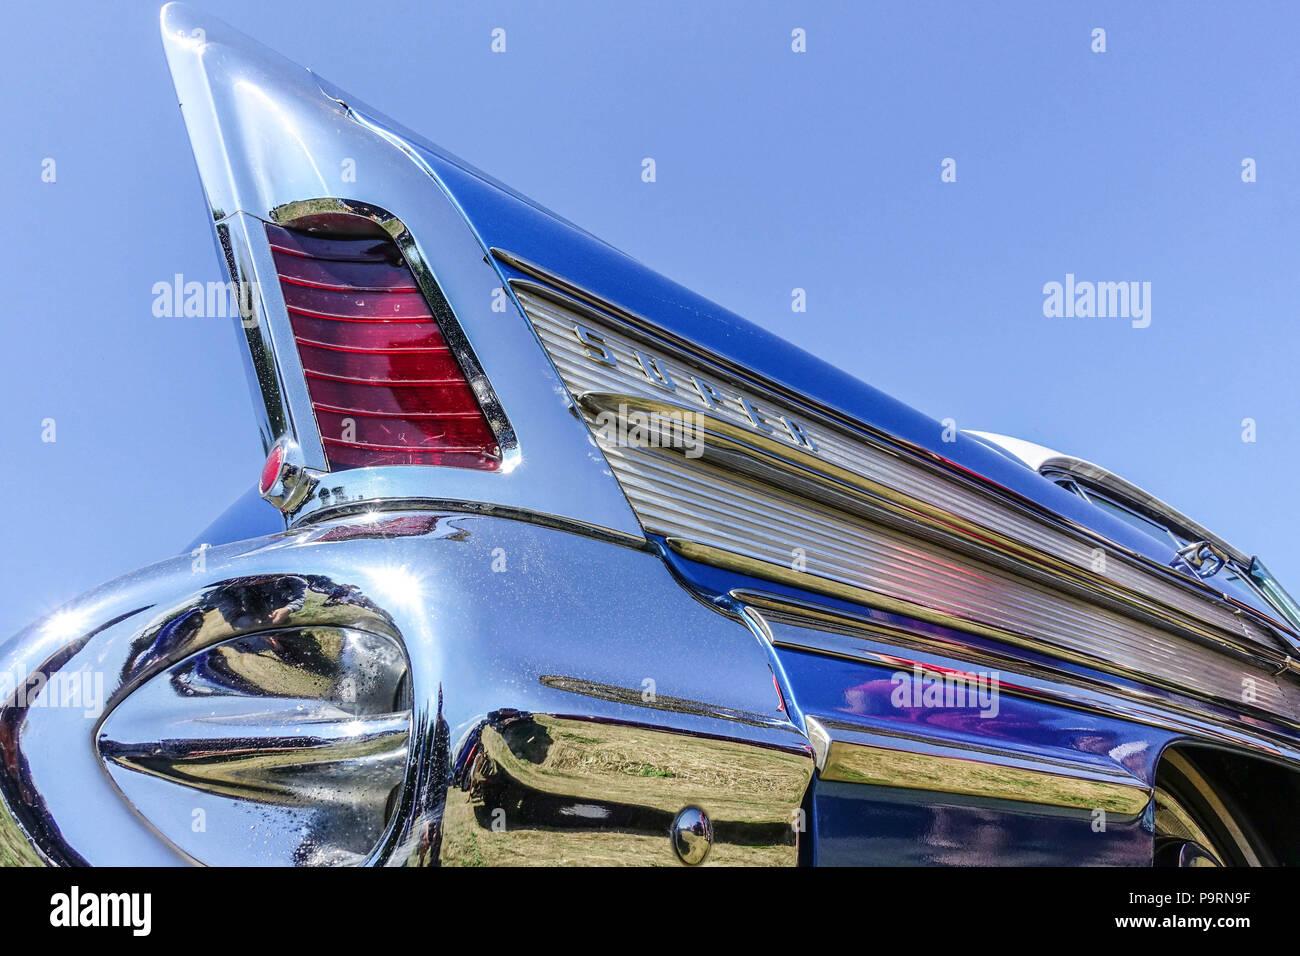 Buick Super Rivera 1958, Schlußleuchten, American Classic Car Stockbild